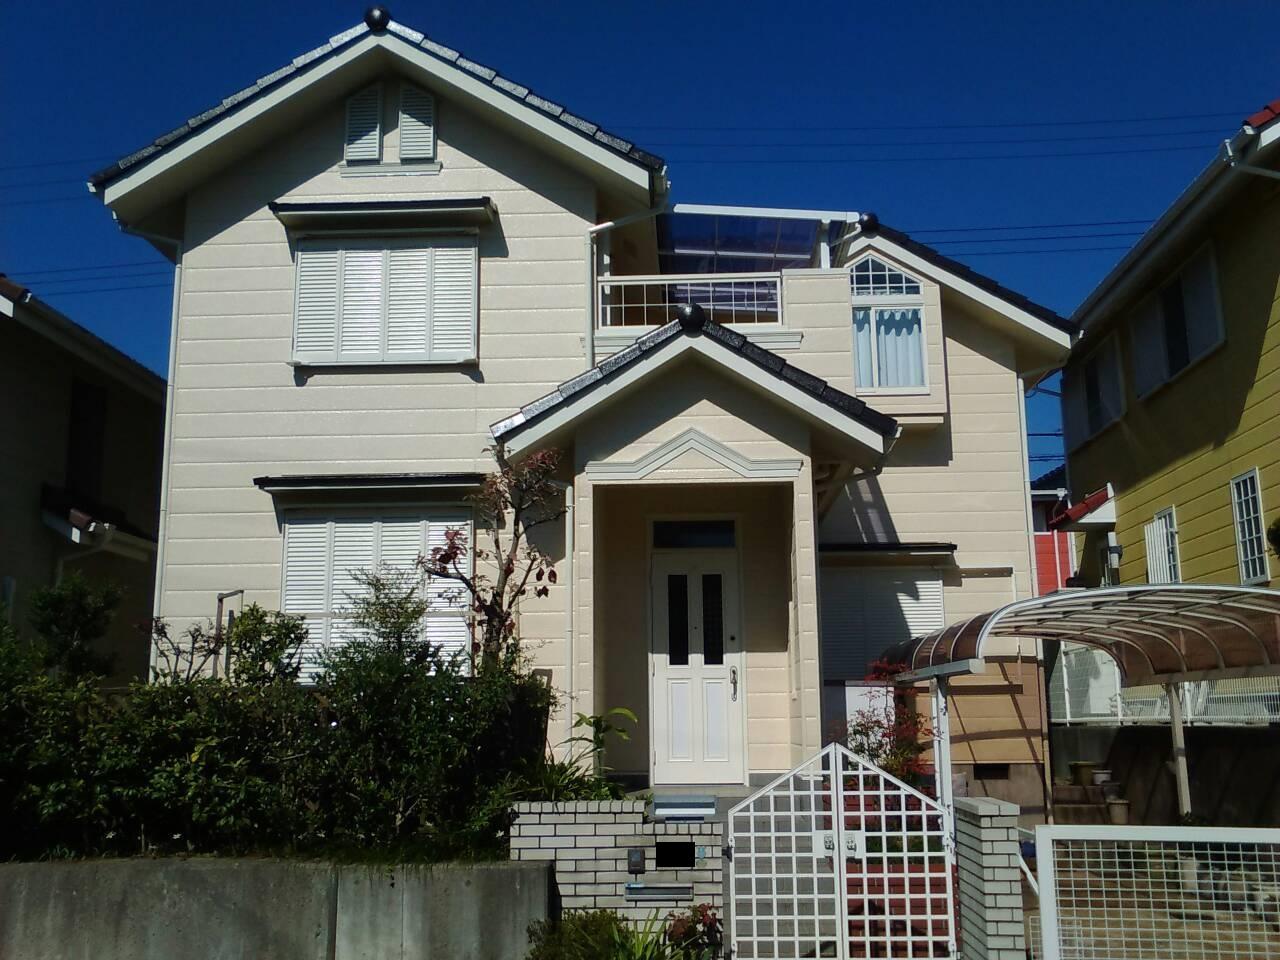 外壁 塗装 神戸 市 西区 神戸市で外壁塗装・屋根塗装なら西川ハウス産業